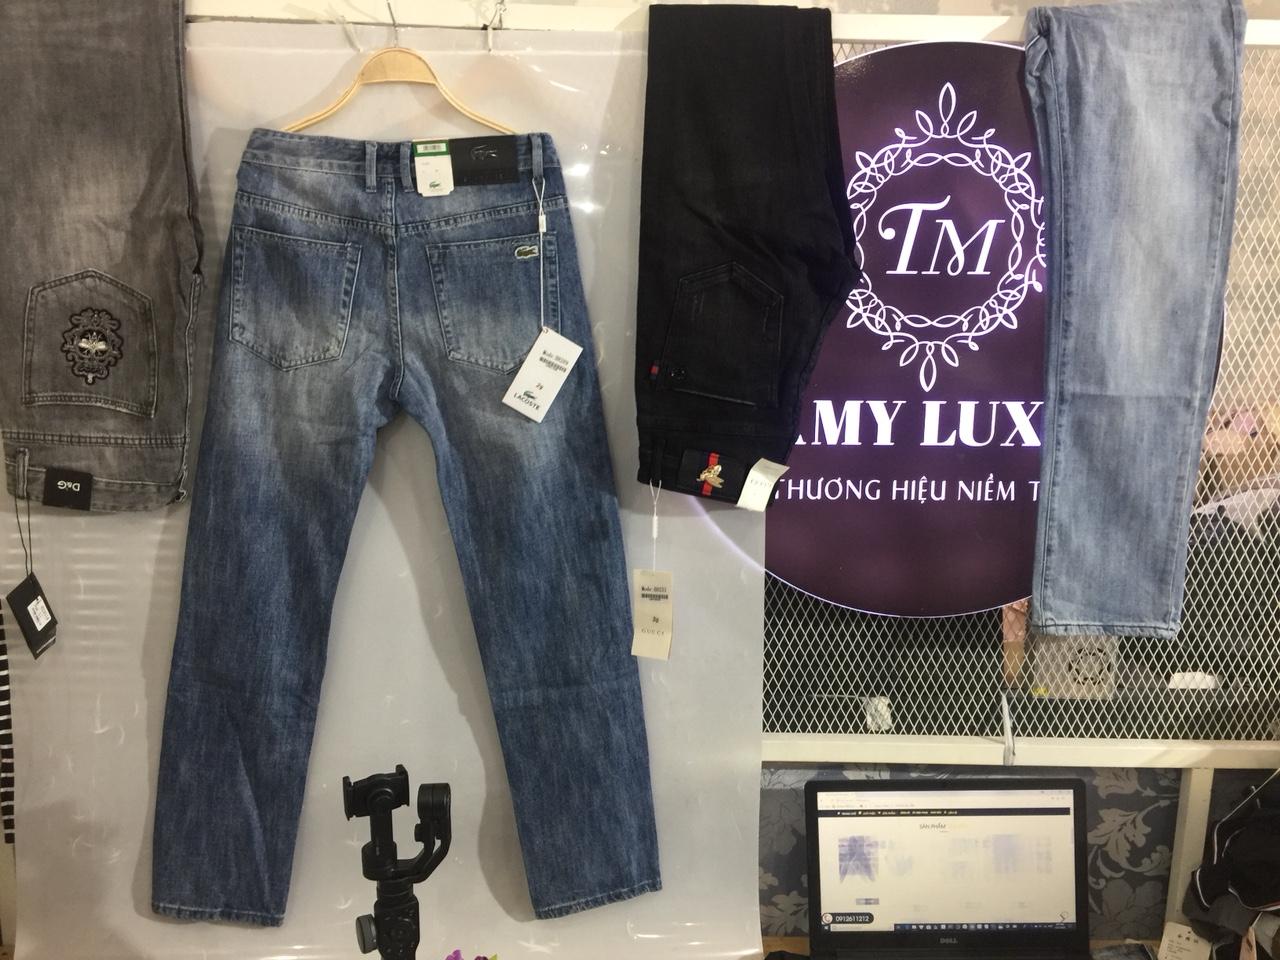 Mua quần jean nam đẹp ở tphcm